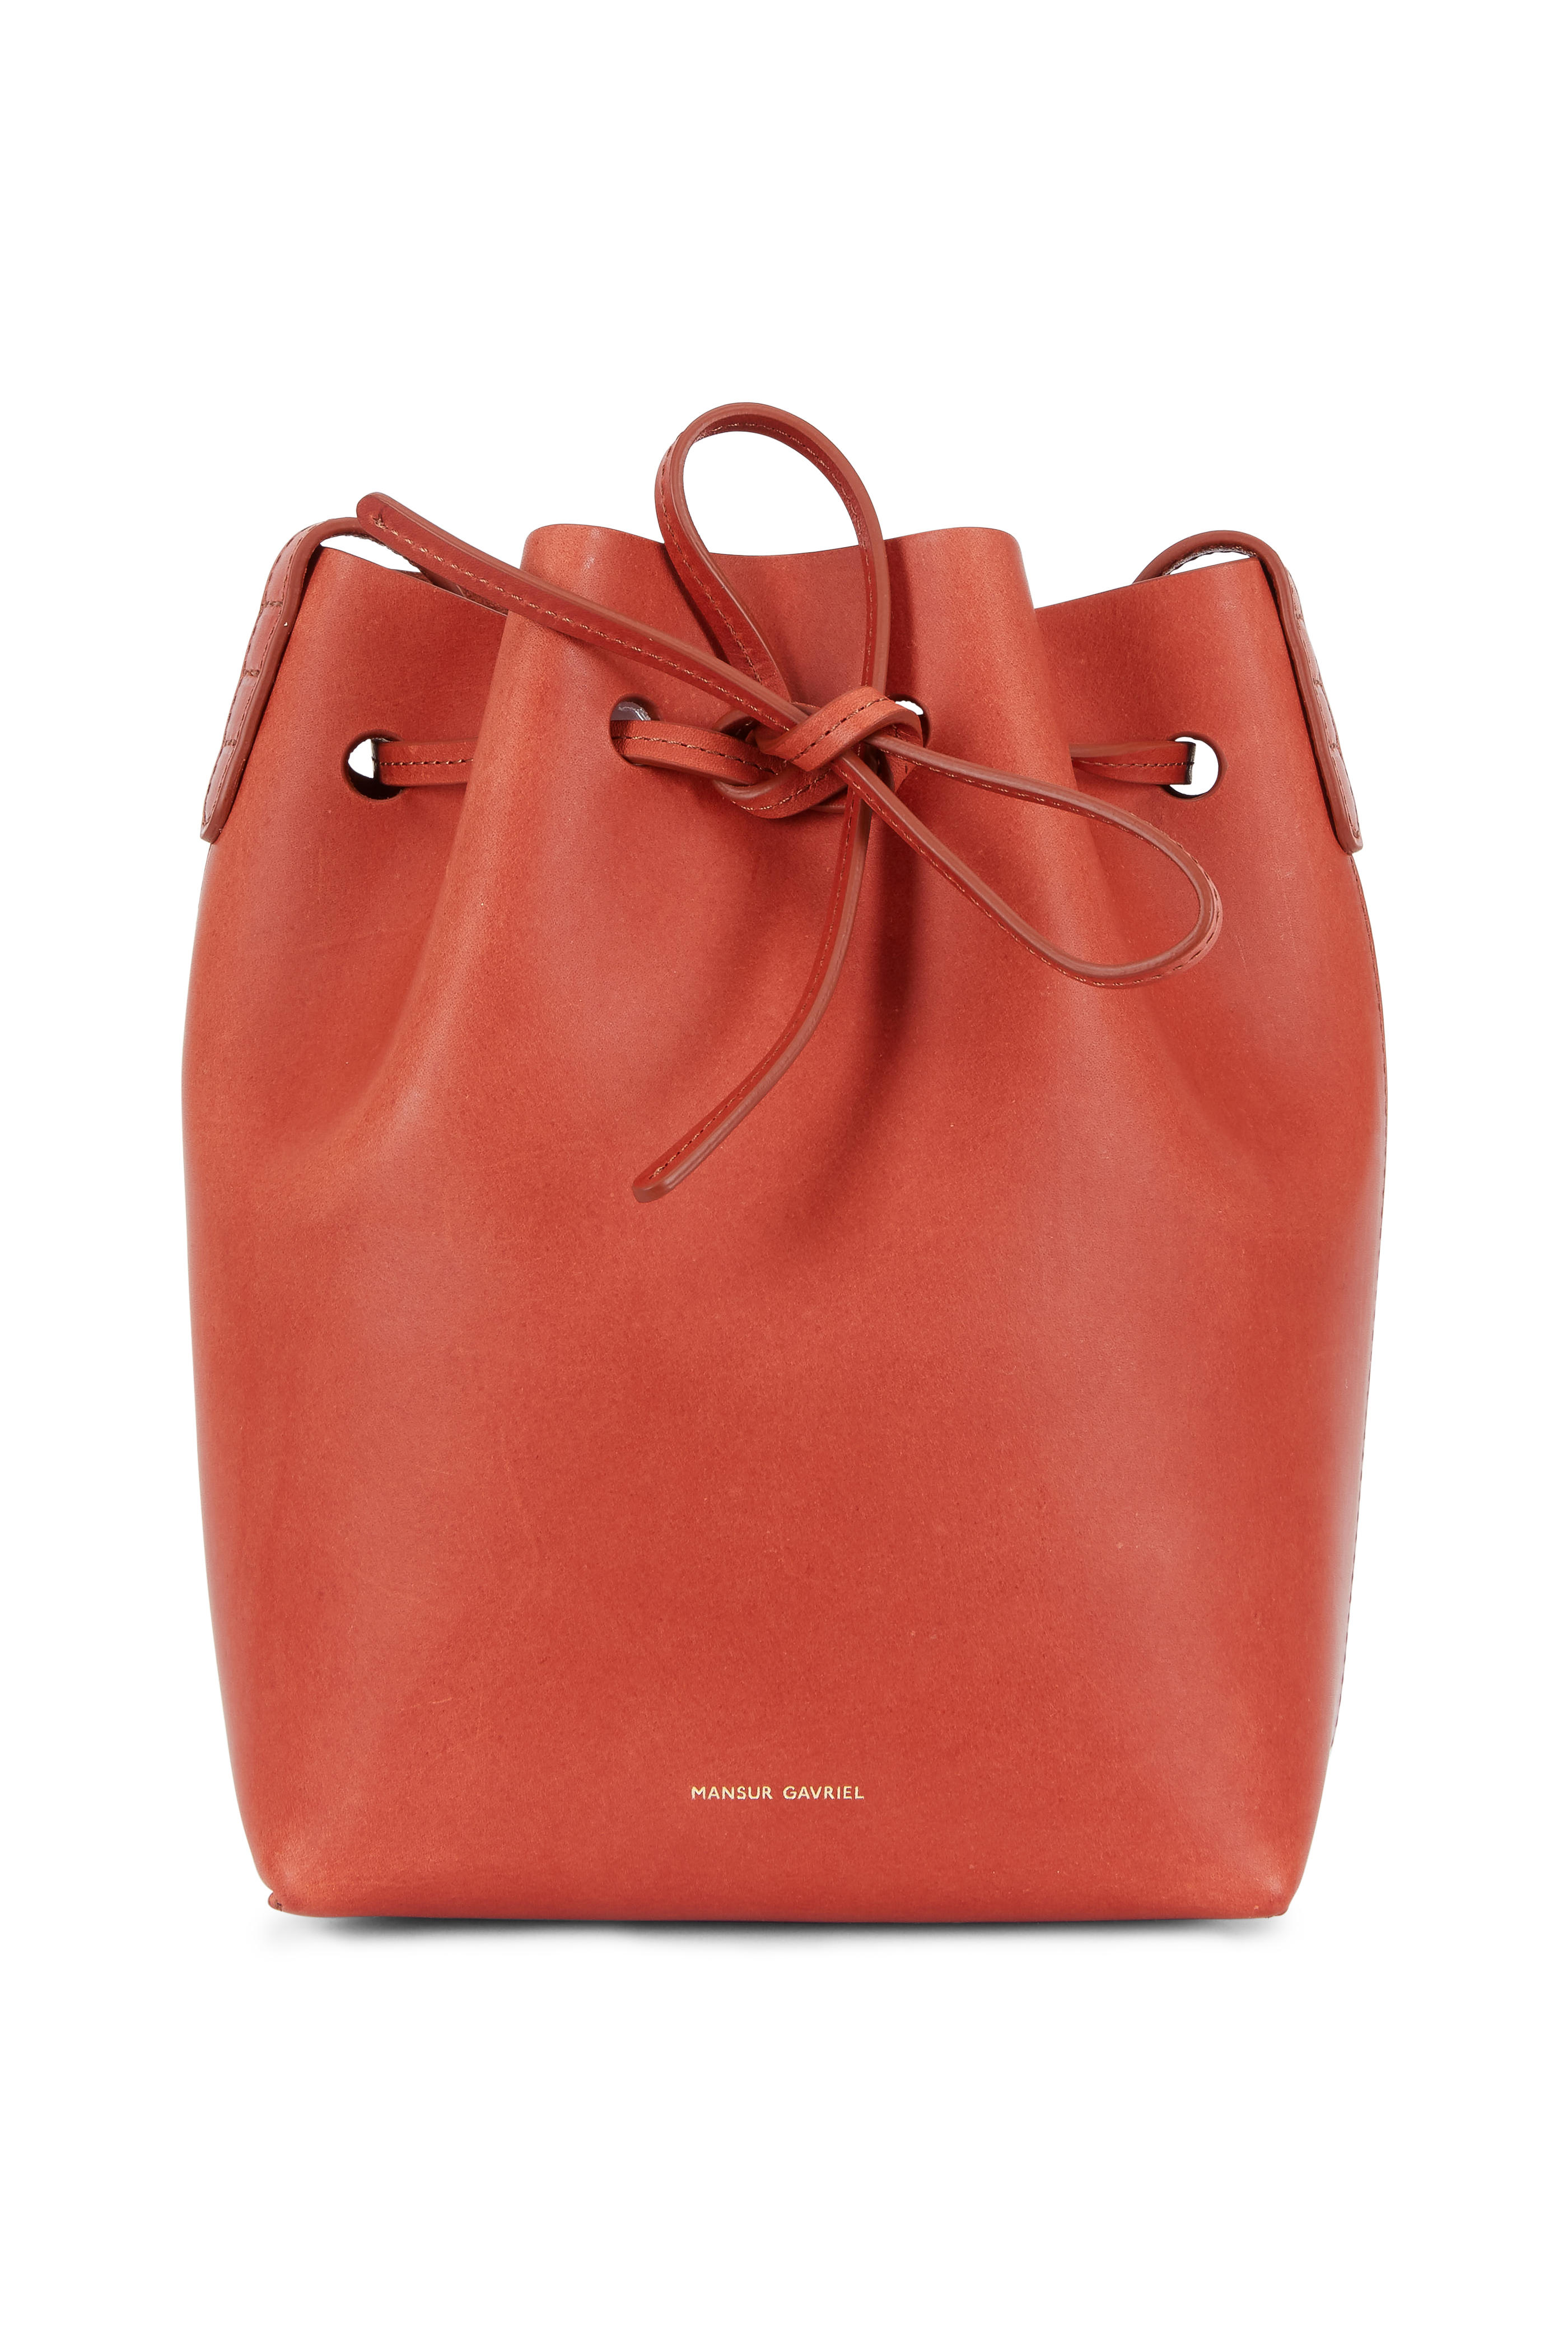 Mansur Gavriel - Brandy Leather Mini Bucket Bag